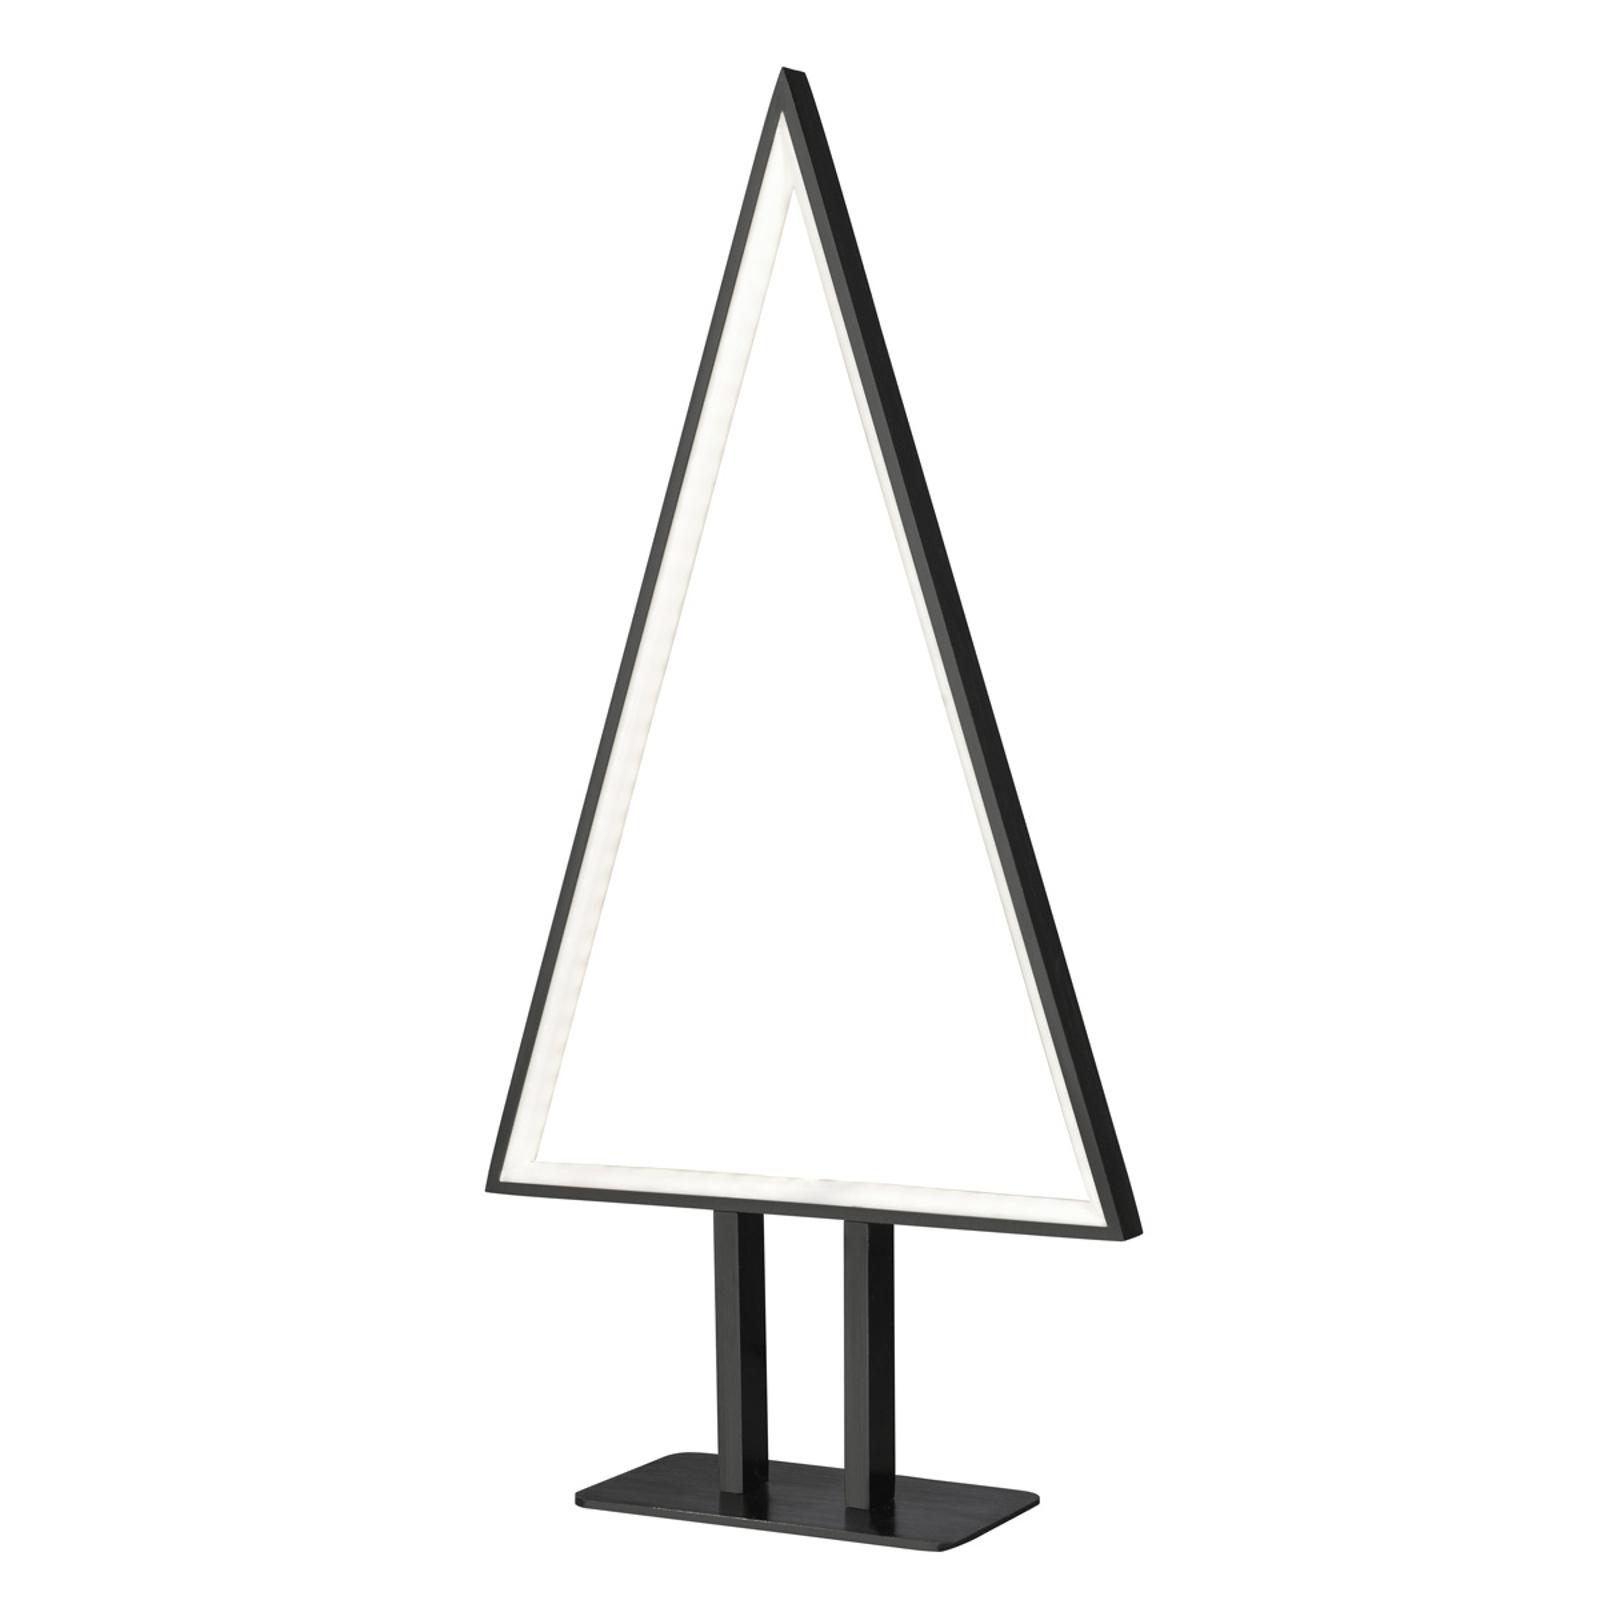 LED-dekorlampe Pine med ekstravagant design svart